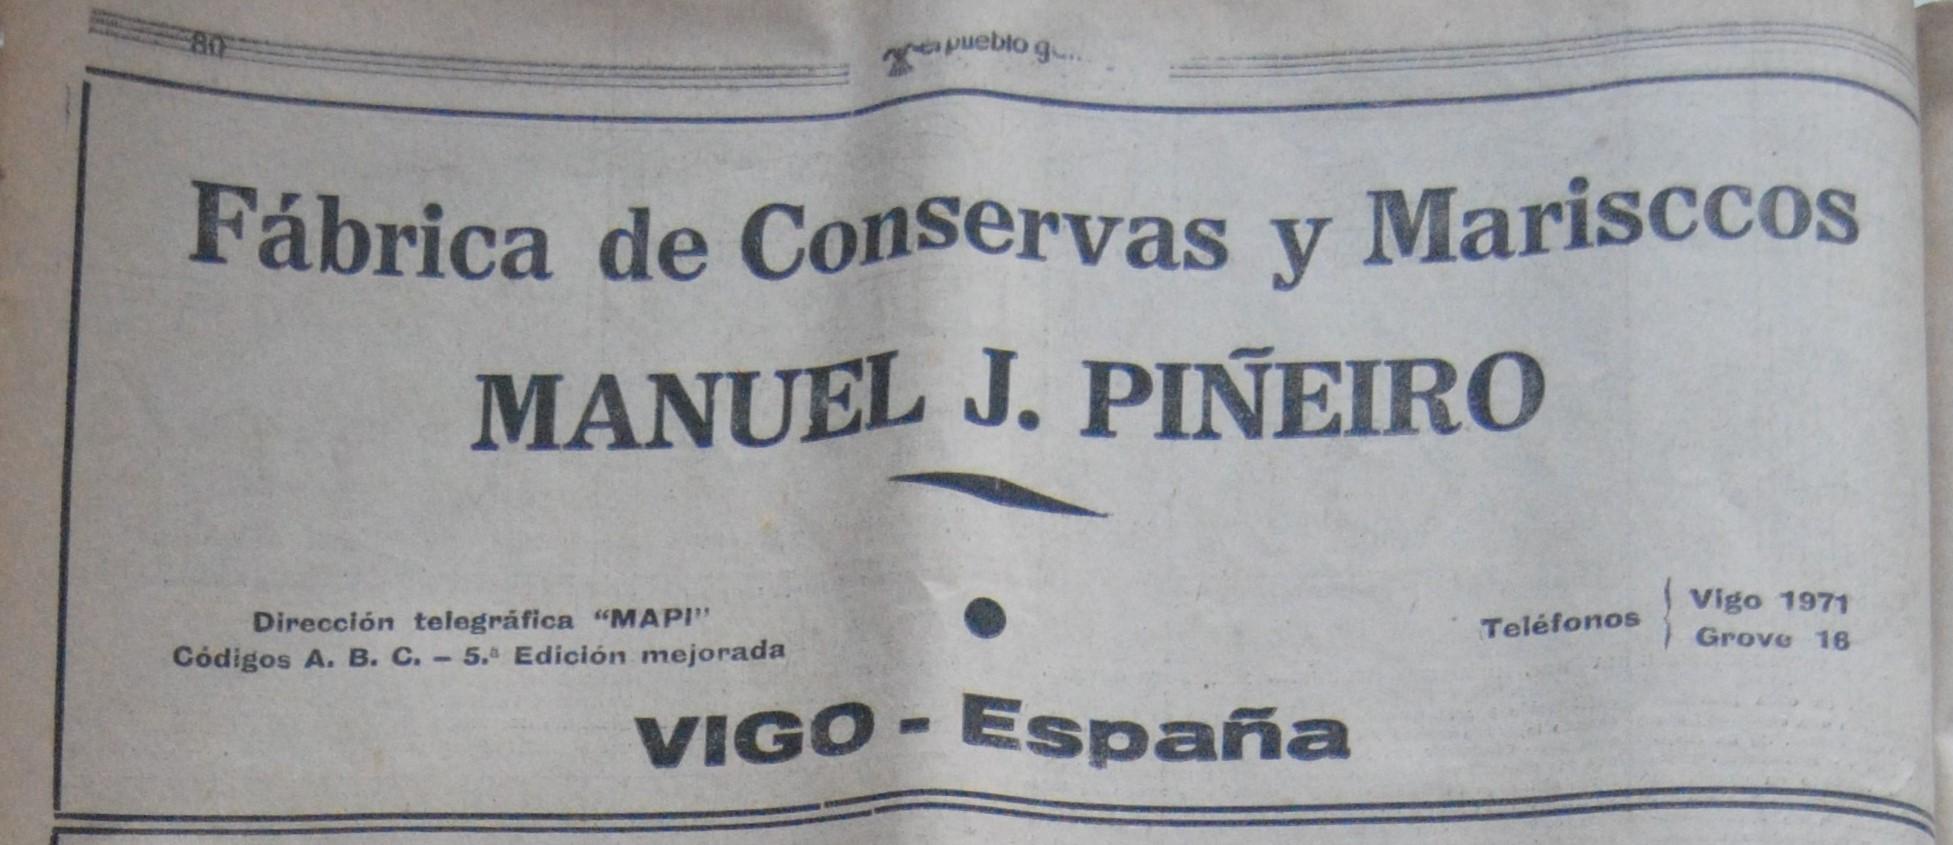 Manuel J. Piñeiro, conserveira